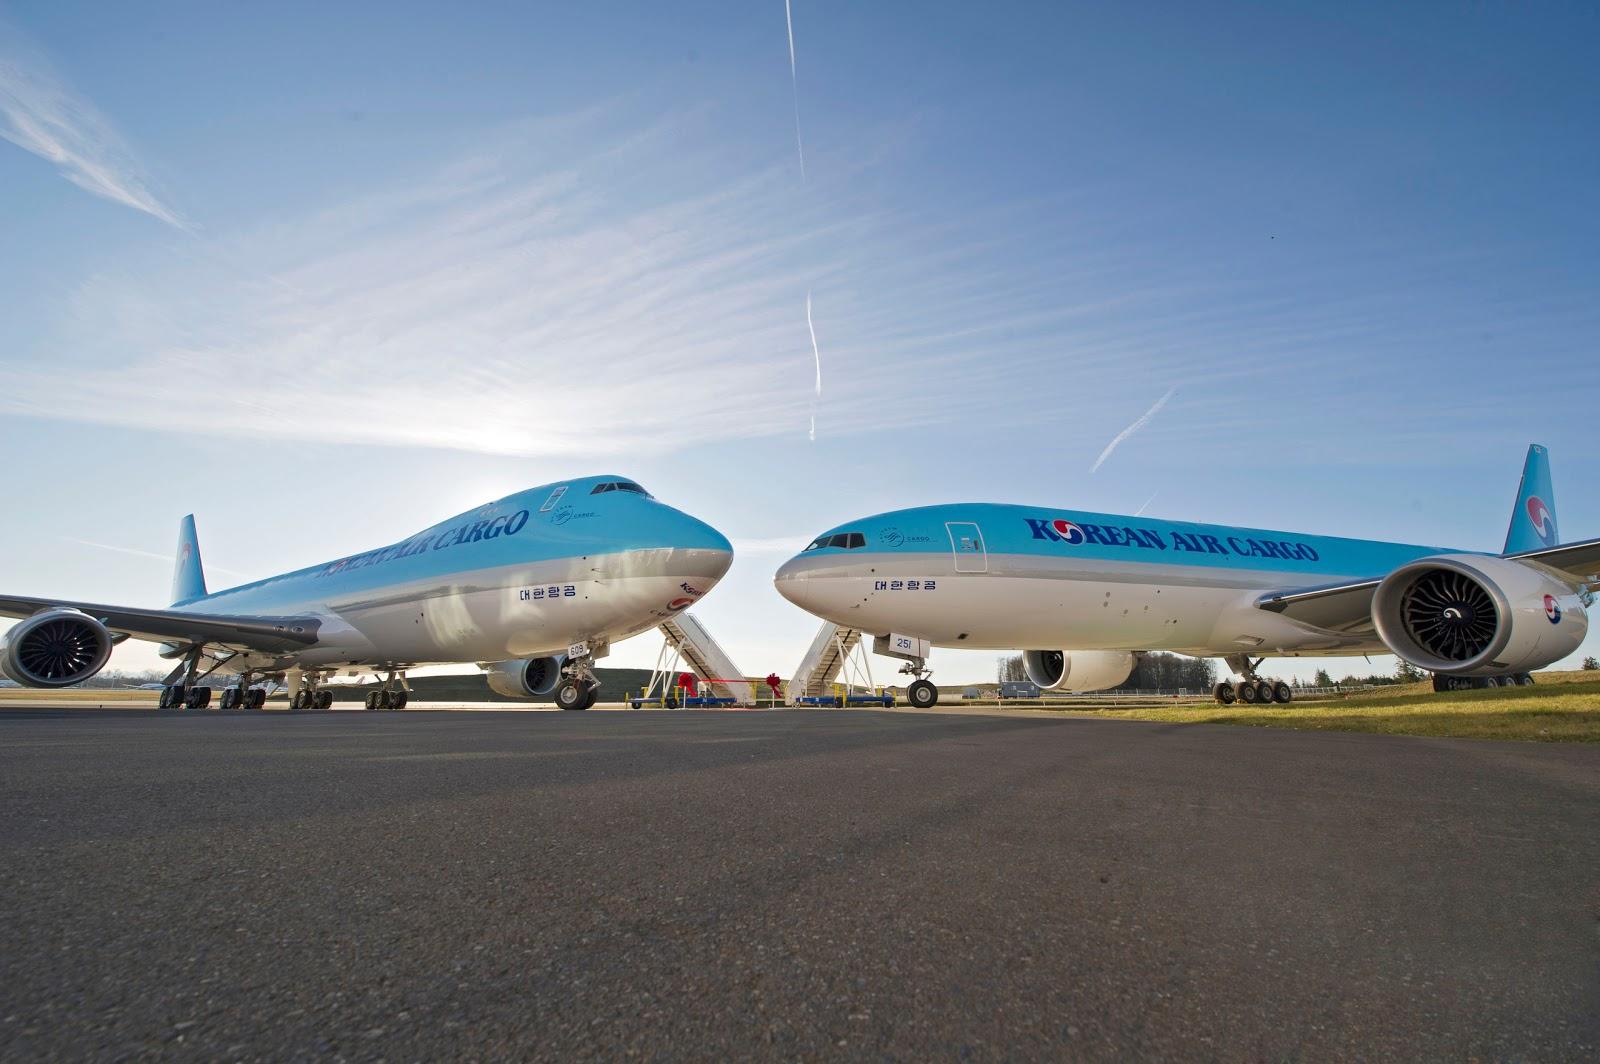 http://2.bp.blogspot.com/-950lO59st50/T9iYO3mVhaI/AAAAAAAAJV8/SiVOOgiemlY/s1600/korean_air_cargo_boeing_747-8f_boeing_777_freighter.jpg